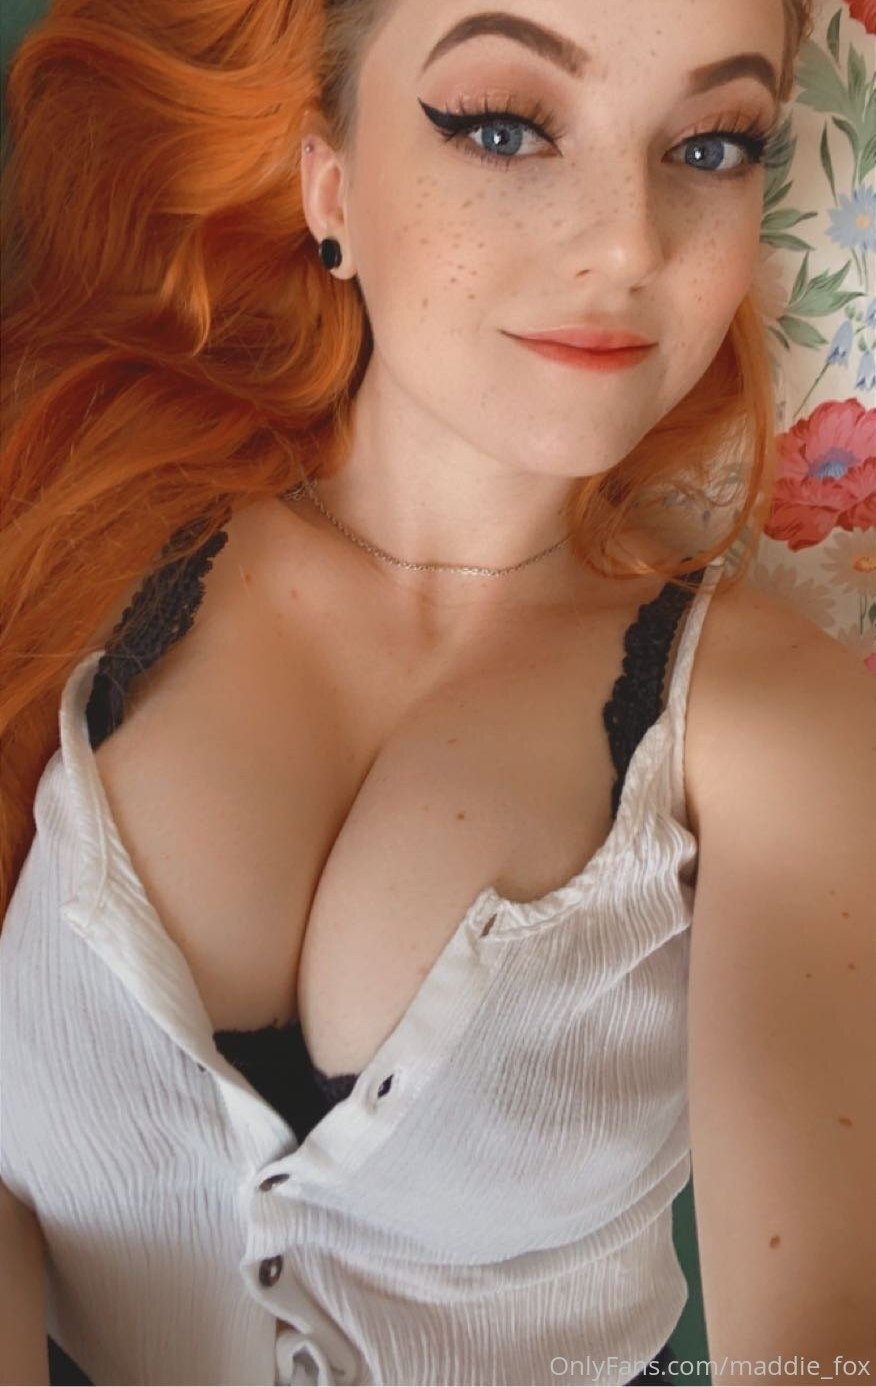 Maddie Fox Onlyfans Nudes Leaks 0038